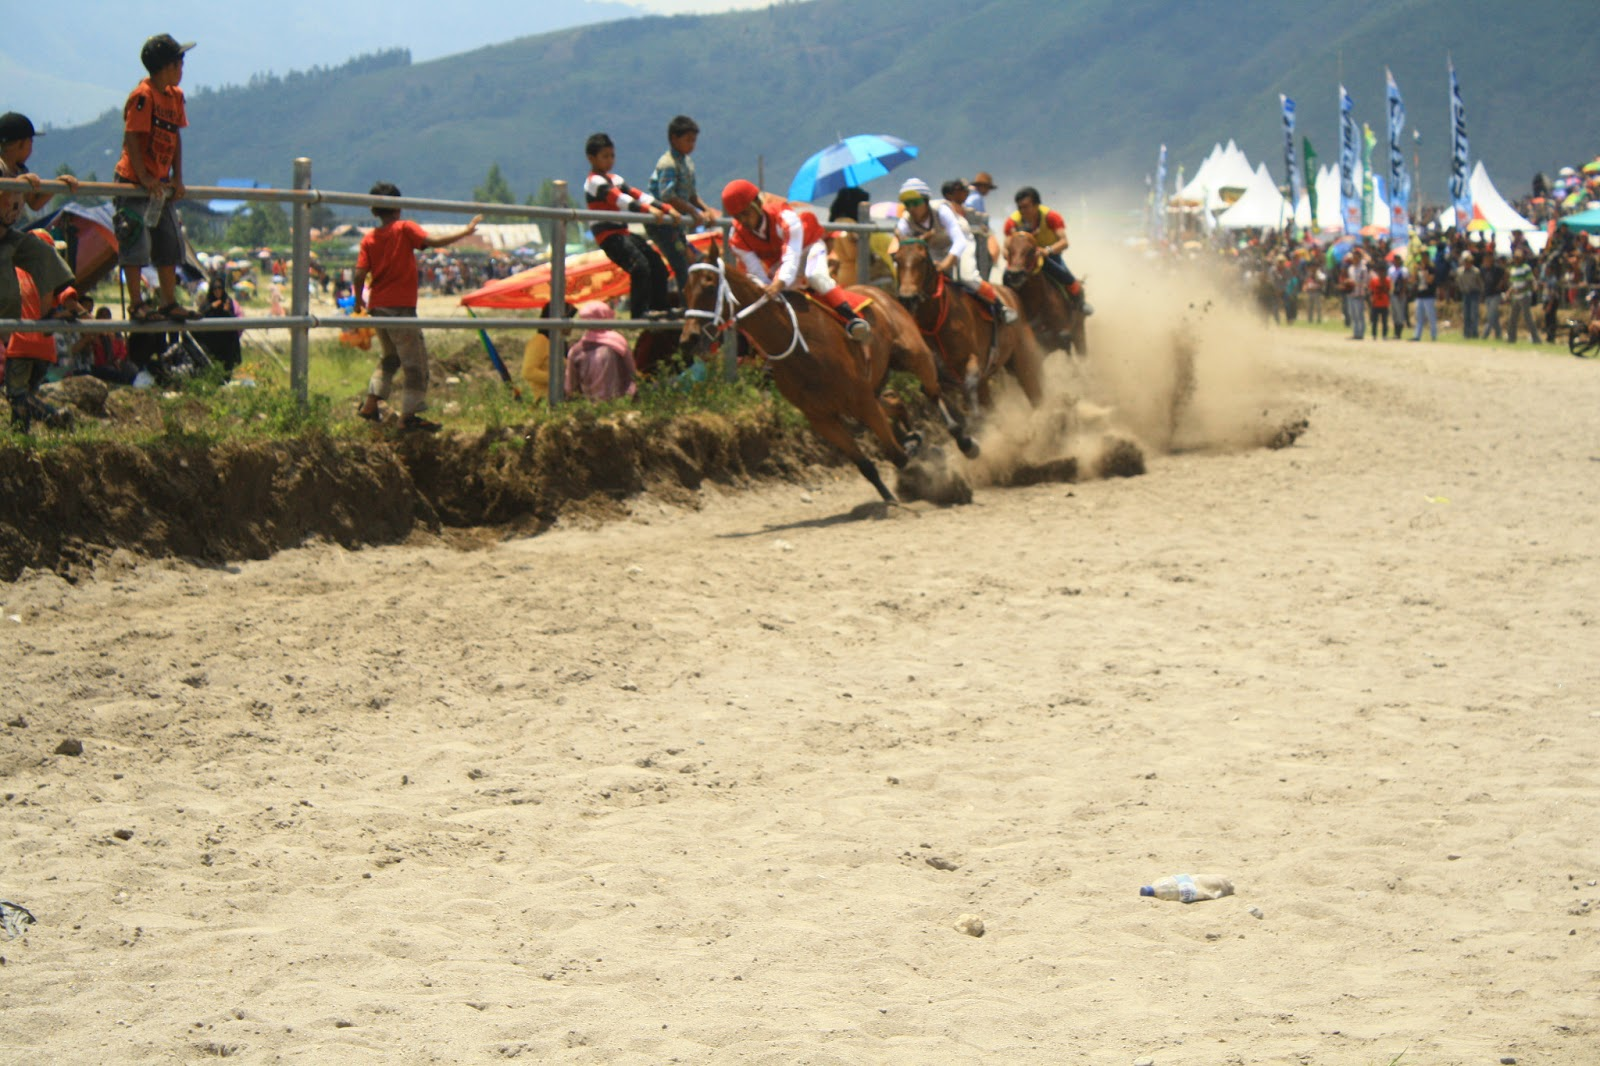 Budaya Aceh, Mengupas Tradisi Pacuan Kuda Masyarakat Gayo